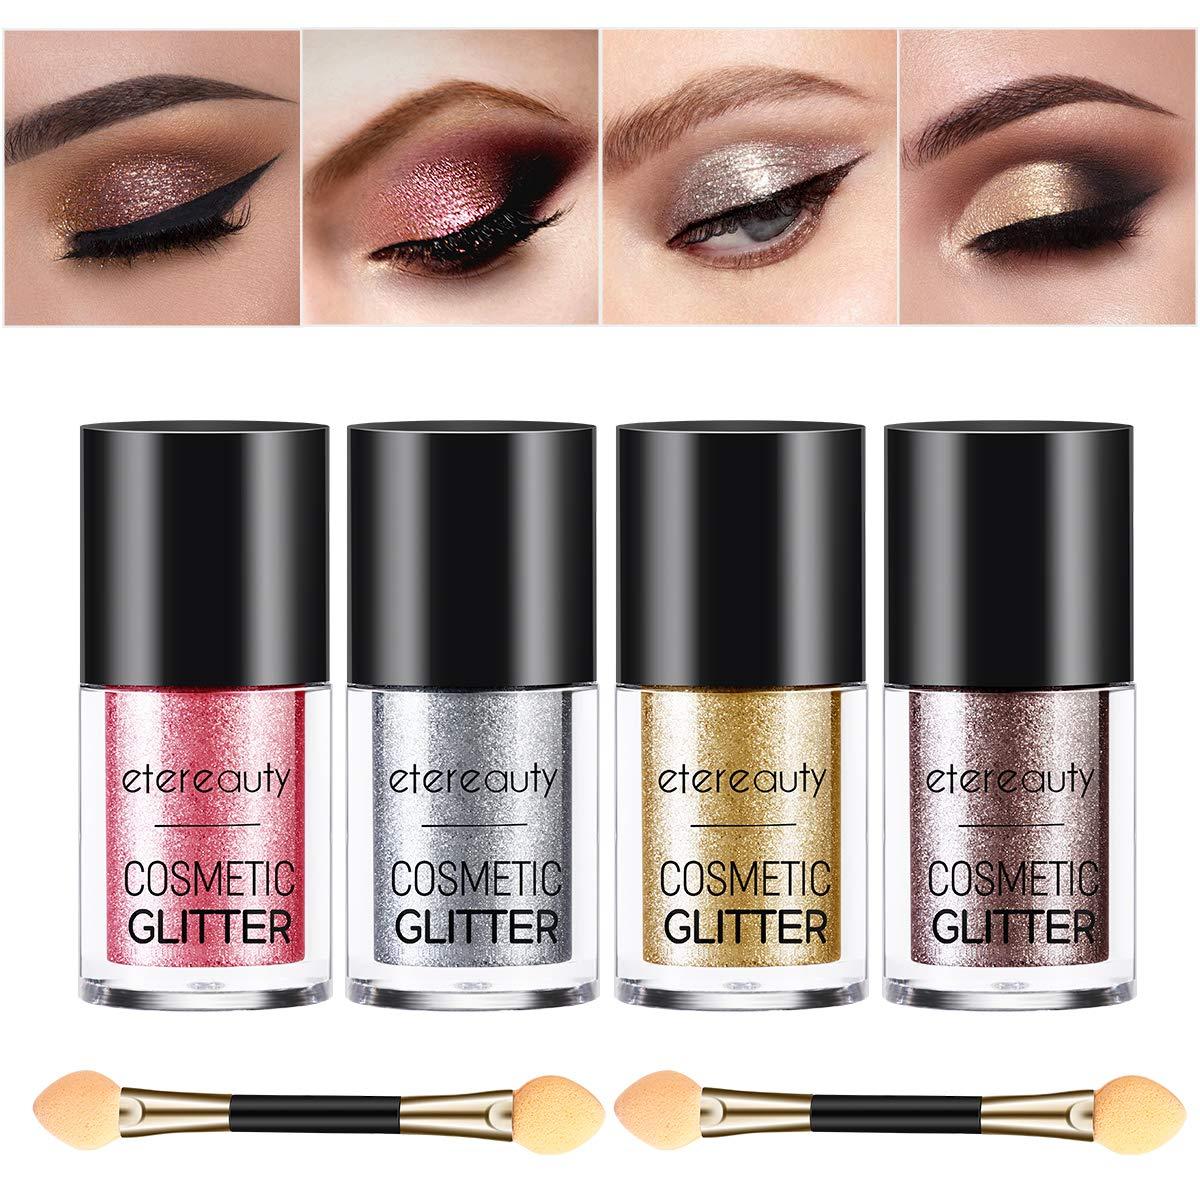 Glitter Eyeshadow, ETEREAUTY 4 Colors Glitter Powder Loose with Eyeshadow Brush